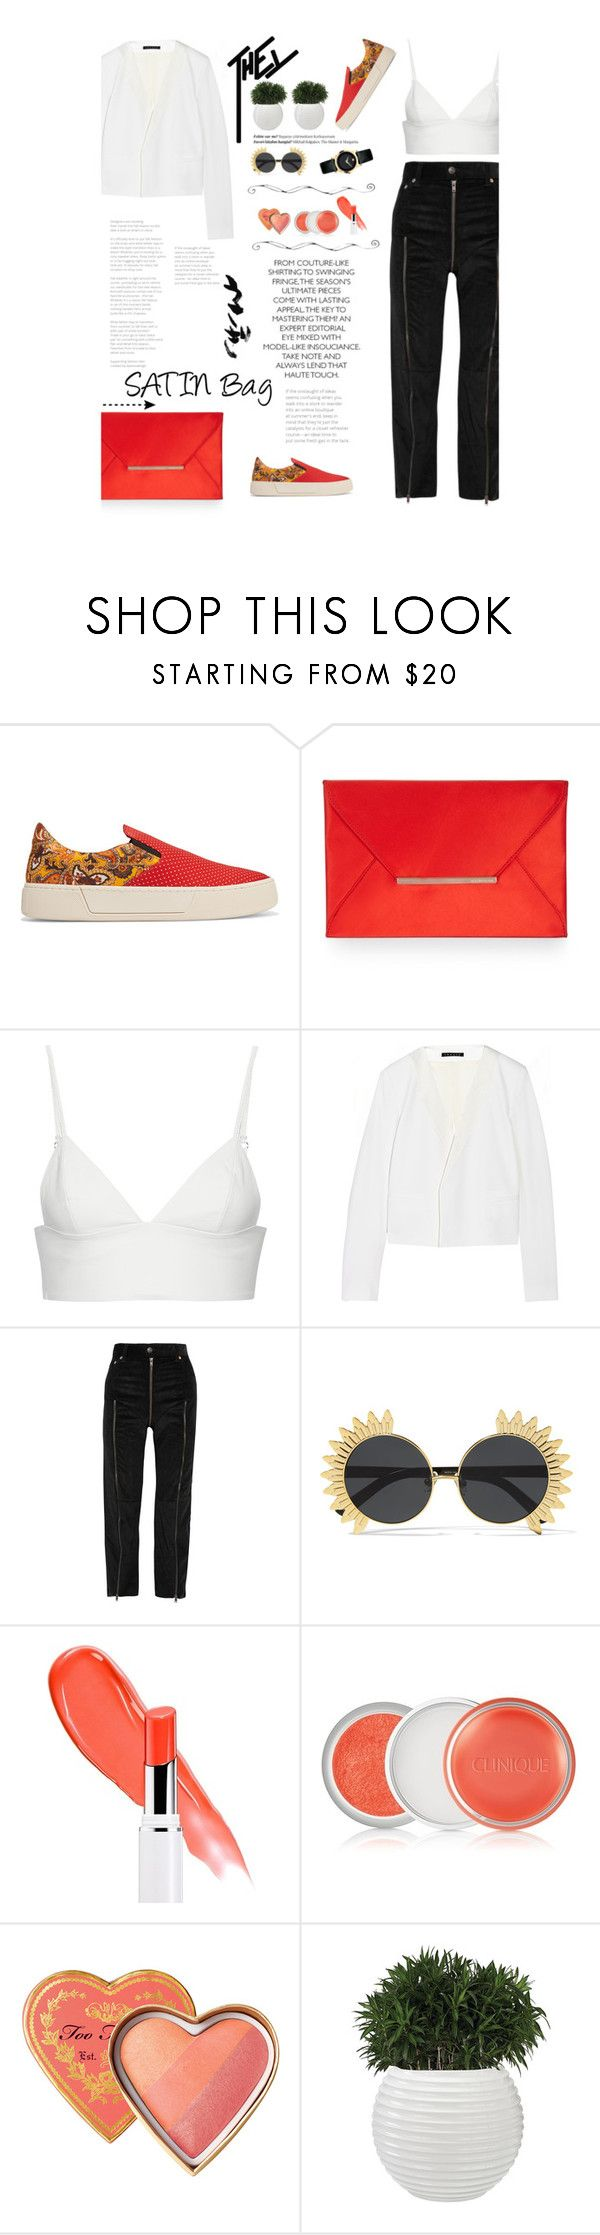 """Trending Bag: SATIN Bag"" by amimcqueen ❤ liked on Polyvore featuring Balenciaga, BCBGMAXAZRIA, T By Alexander Wang, Theory, Vetements, Linda Farrow, Clinique, Movado and Balmain"